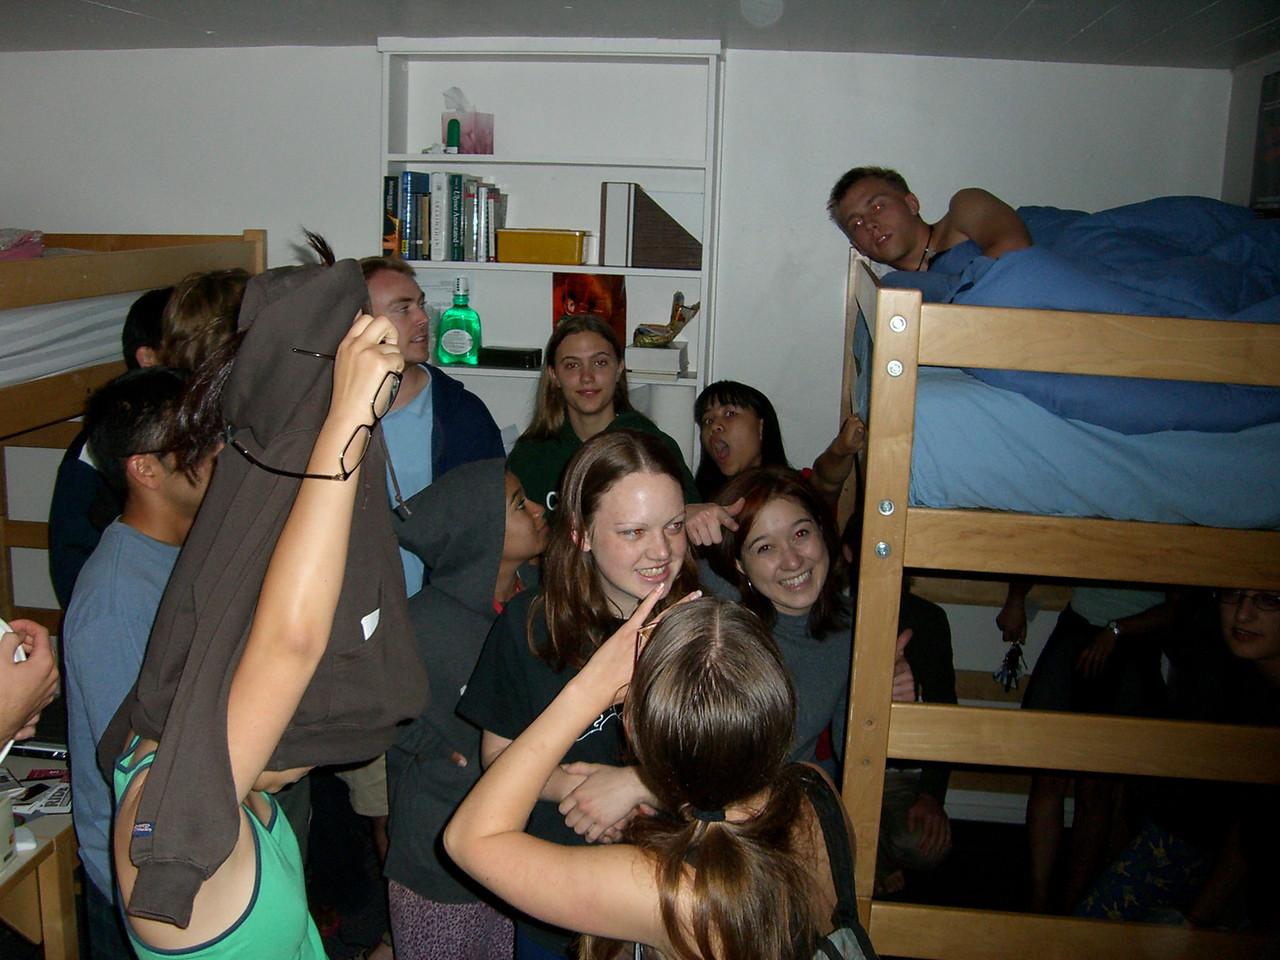 The 8th - Jenn Kim gets stuck as Tmony invades David Chiang & nekkid roomie's dorm